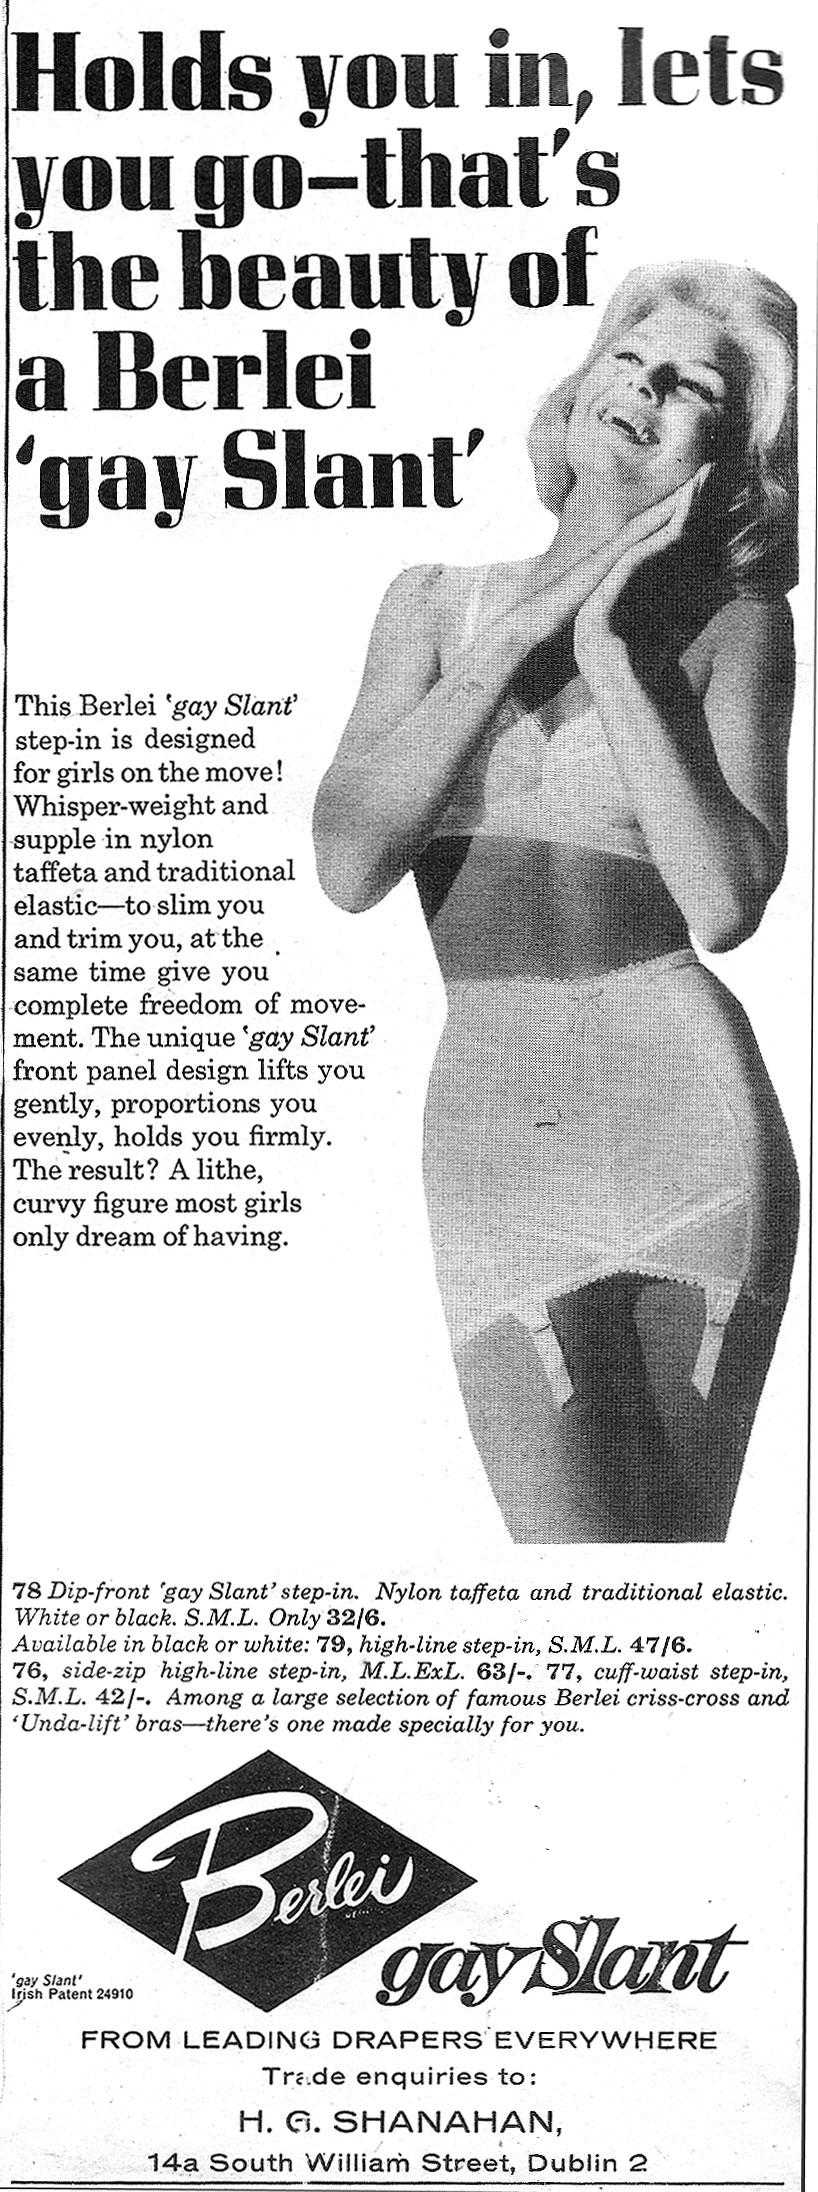 berlei-gay-slant-ireland-1966-undergarment